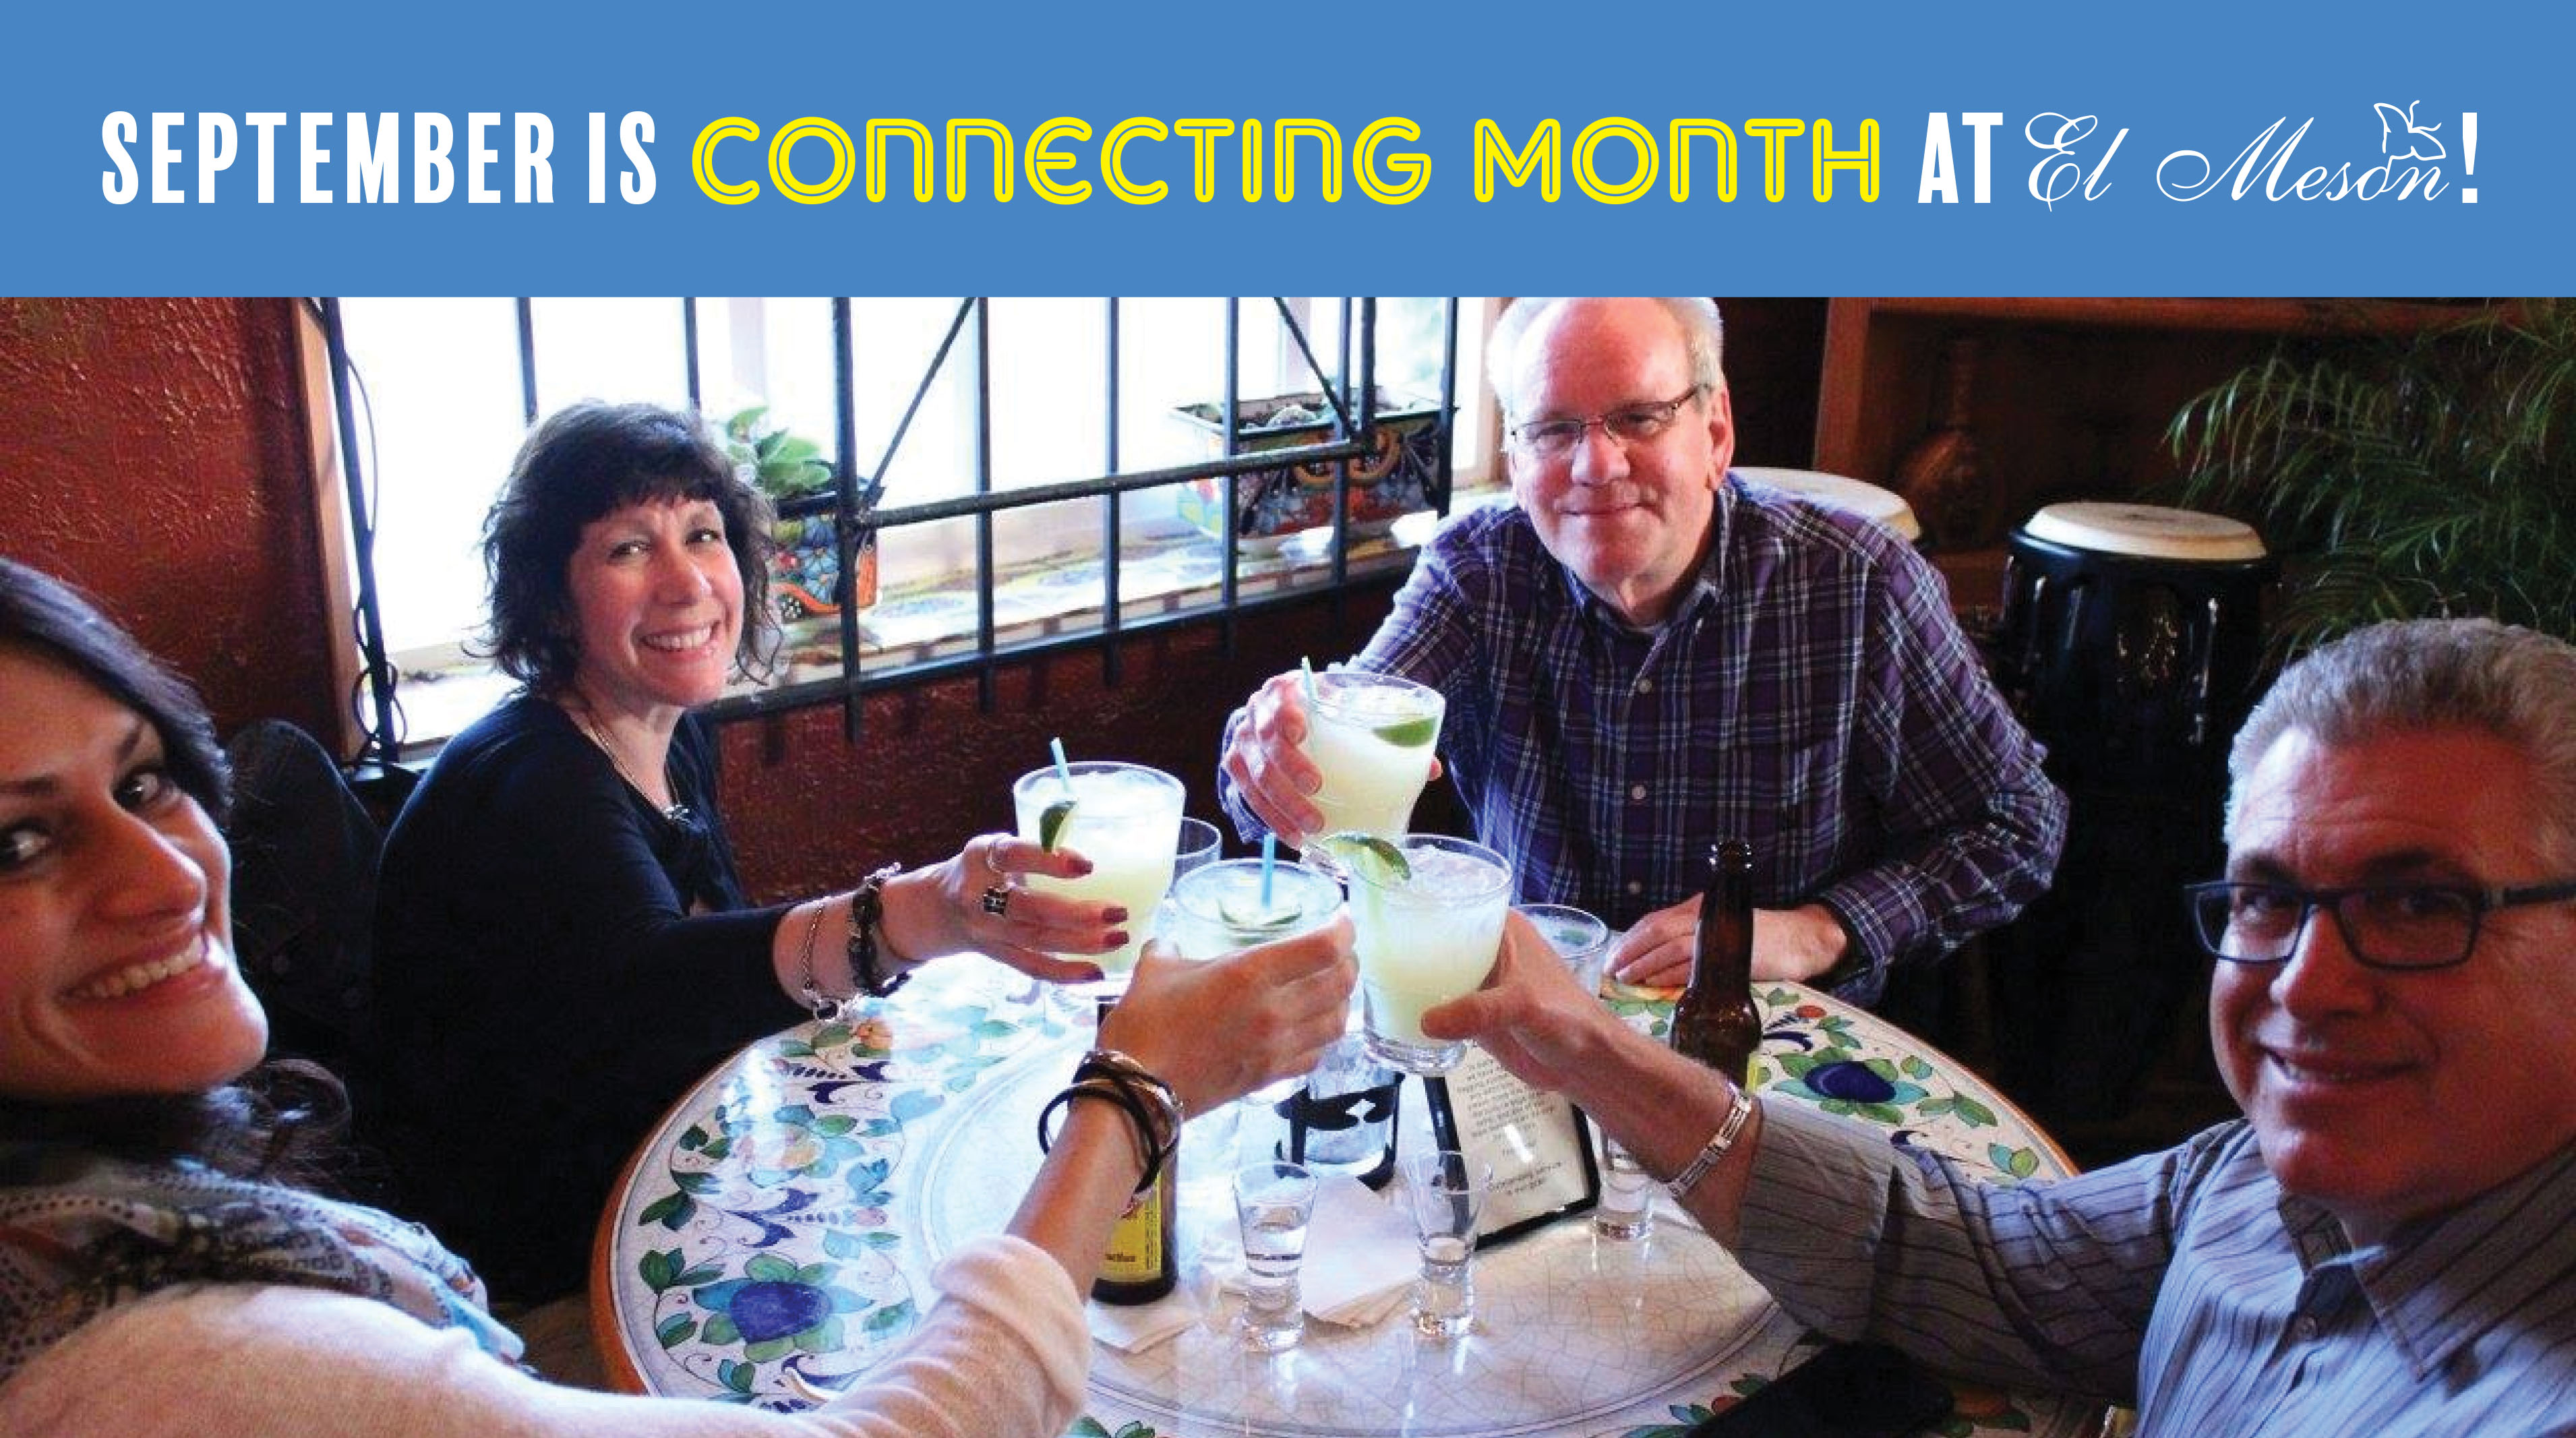 connecting-month-header.jpg